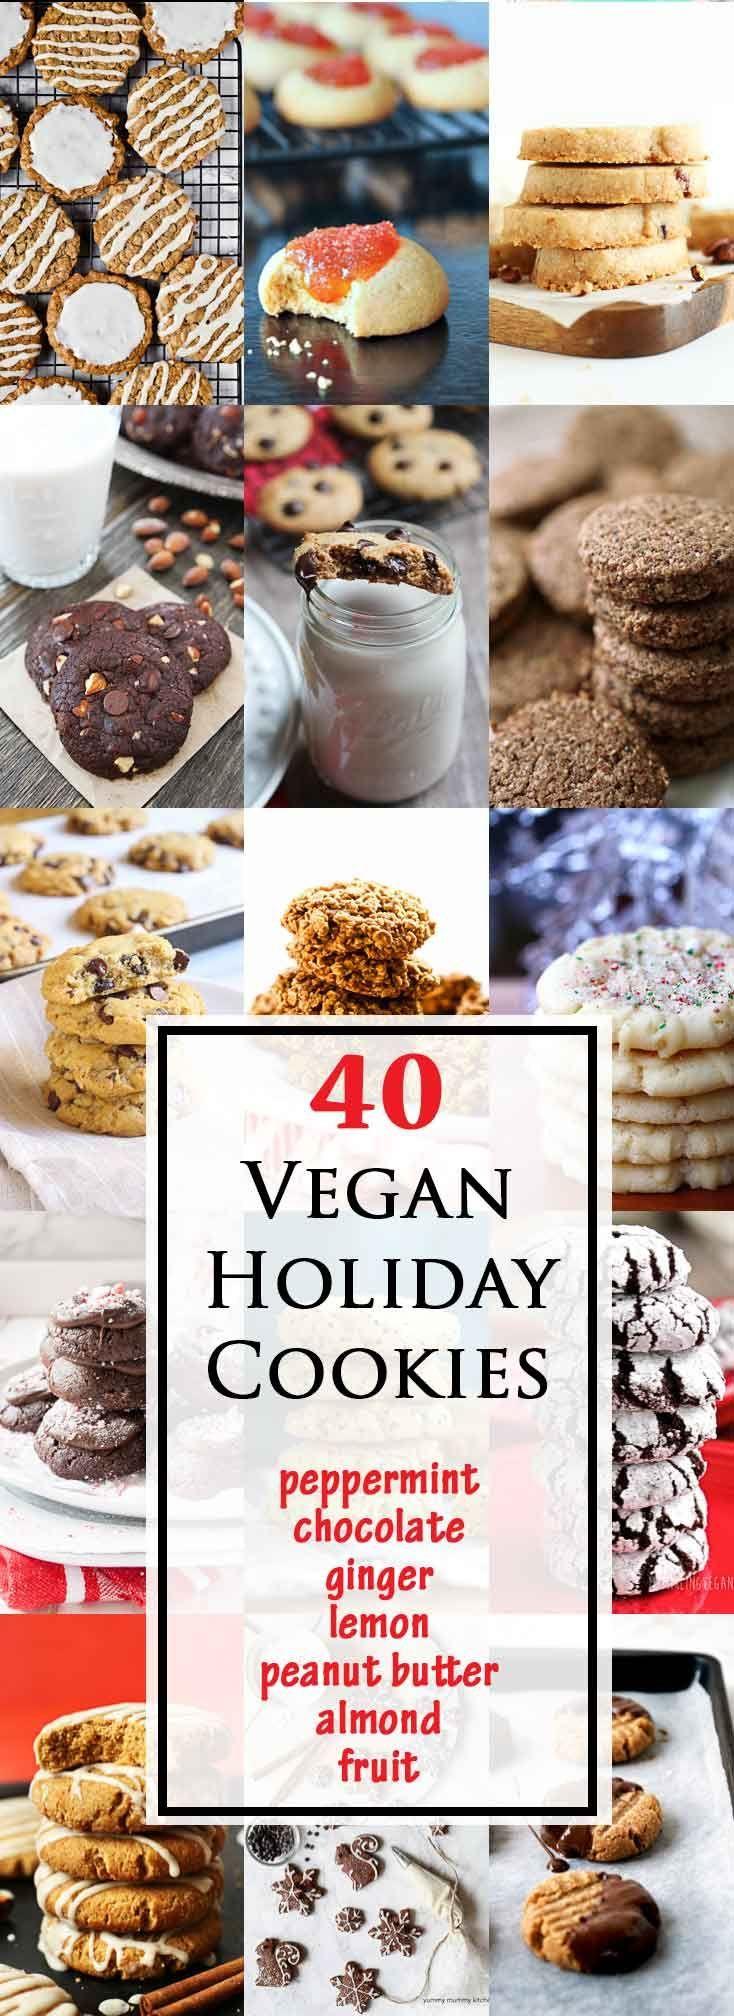 40 Best Vegan Cookies for the Holidays #vegan #glutenfree | Vegetarian Gastronomy | www.Vegetariangastronomy.com